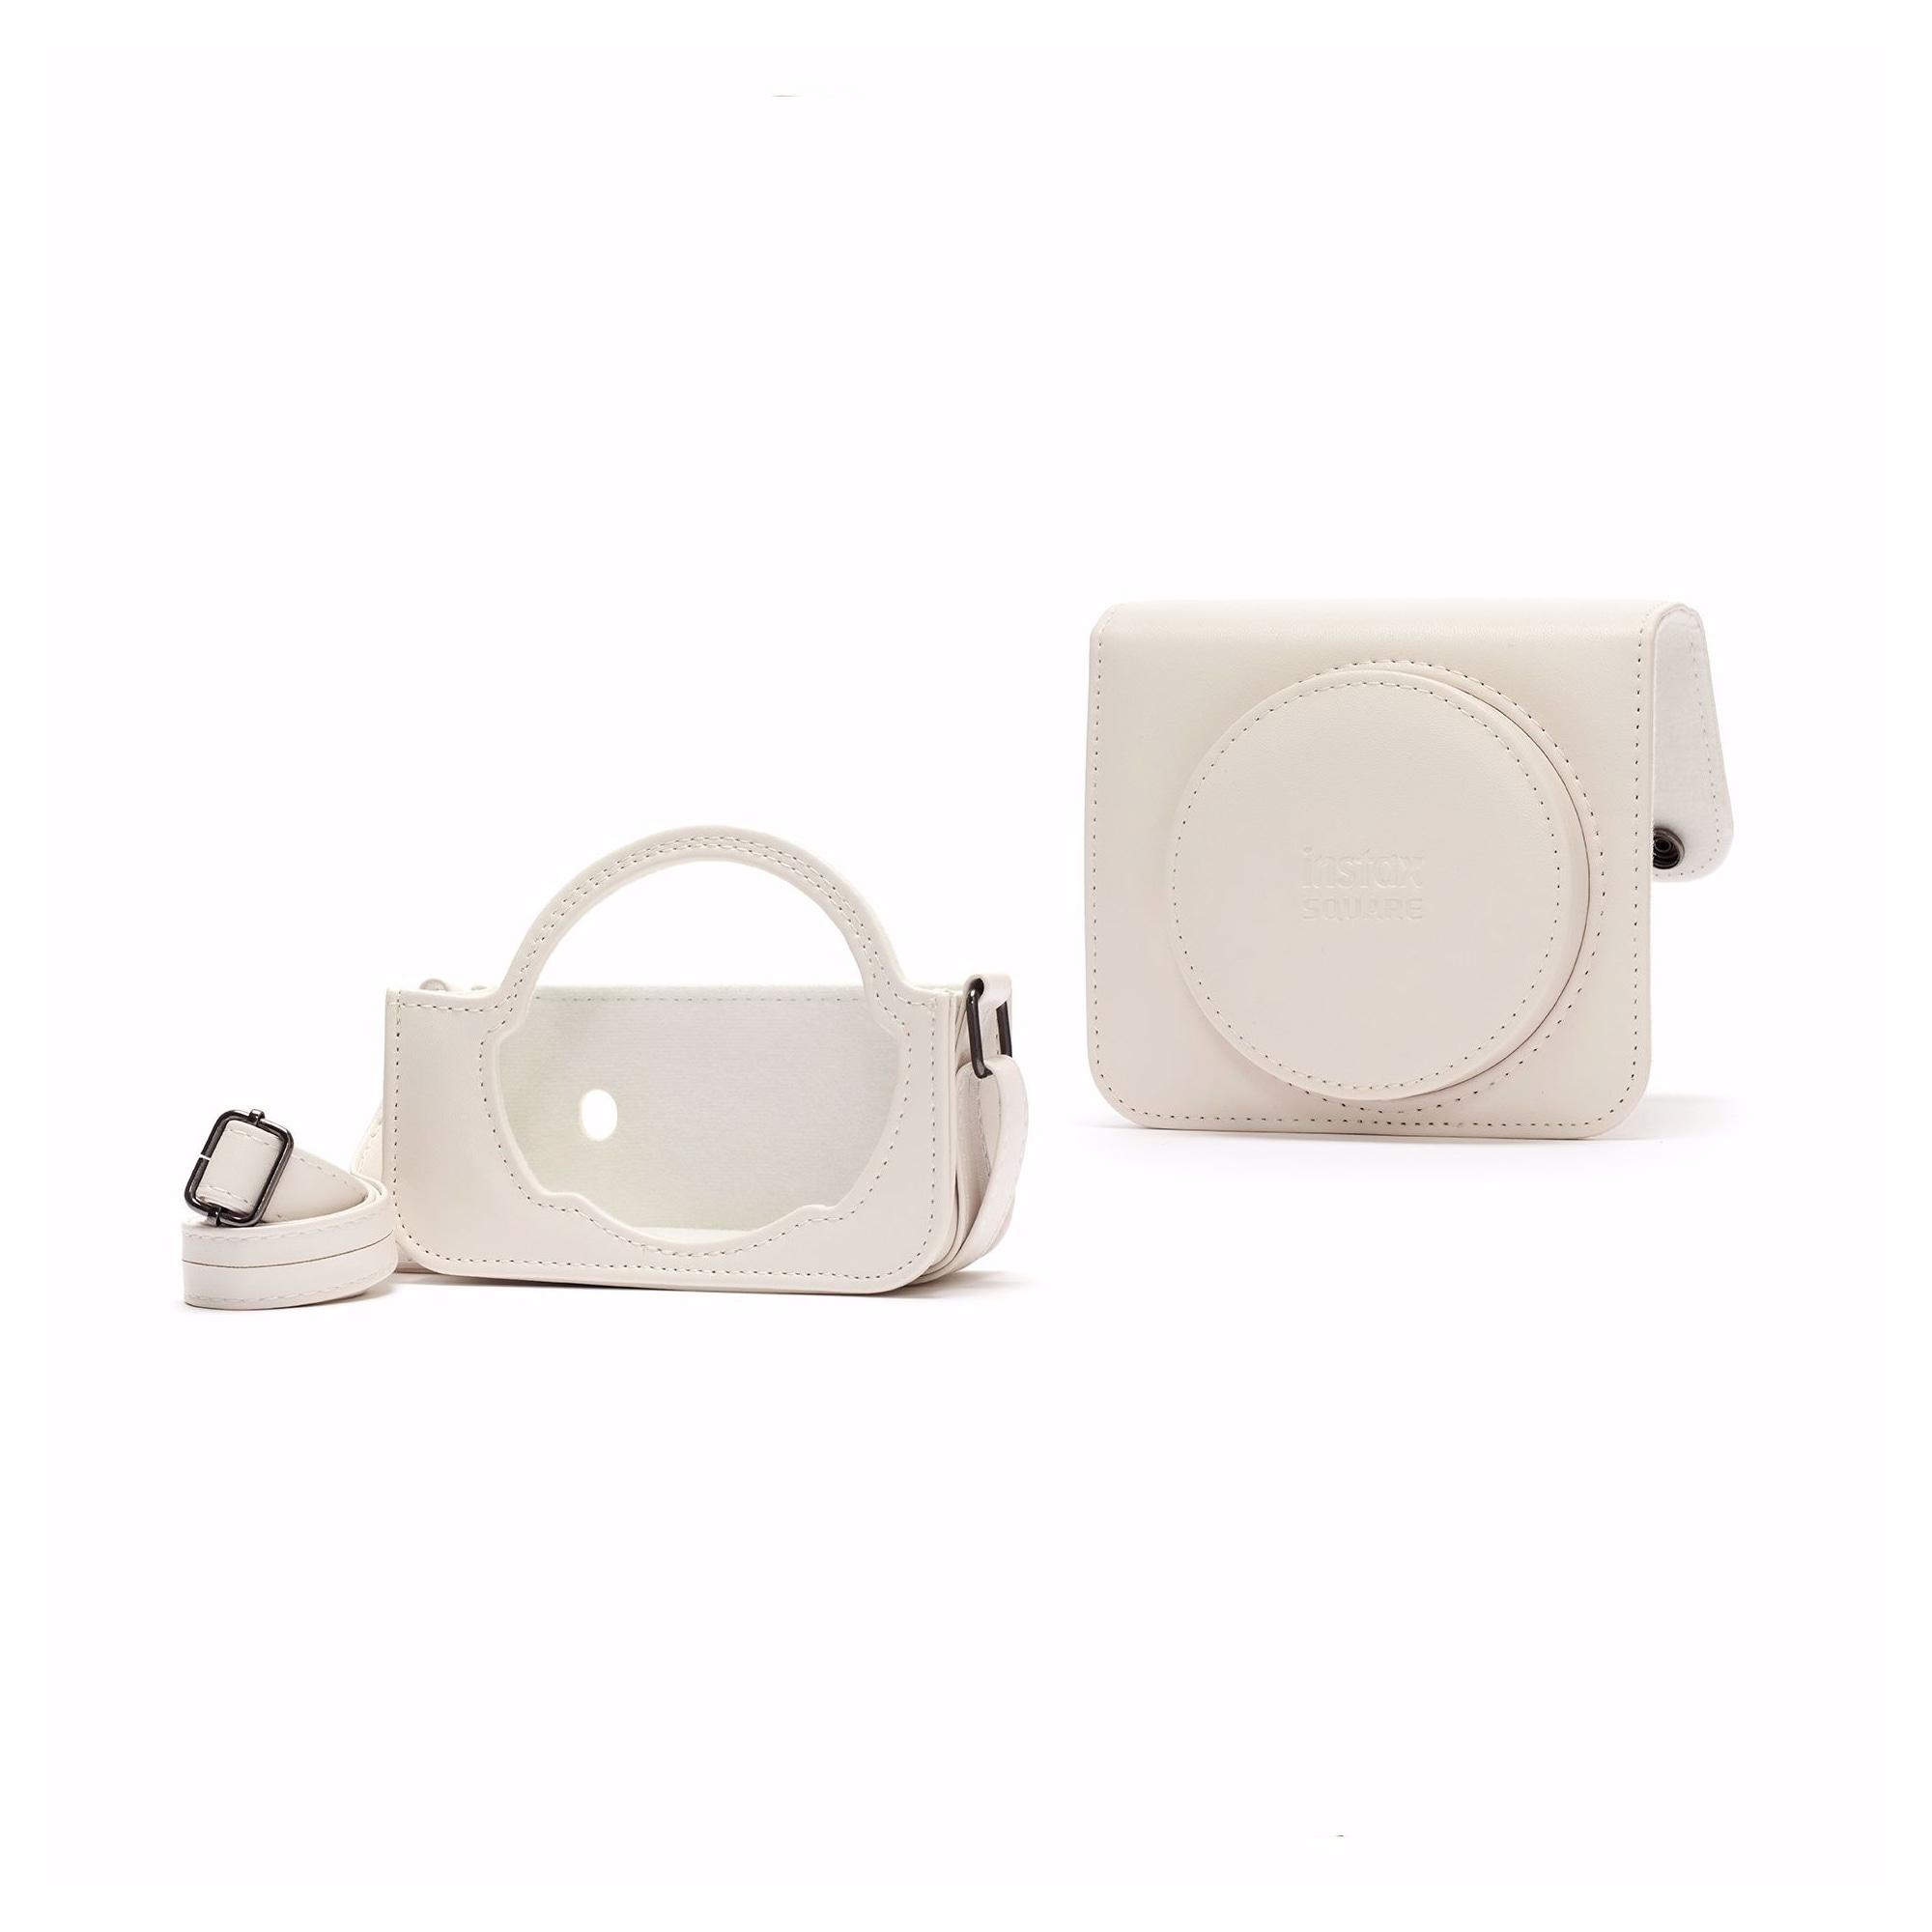 Fujifilm Instax Square SQ1 Case Chalk White